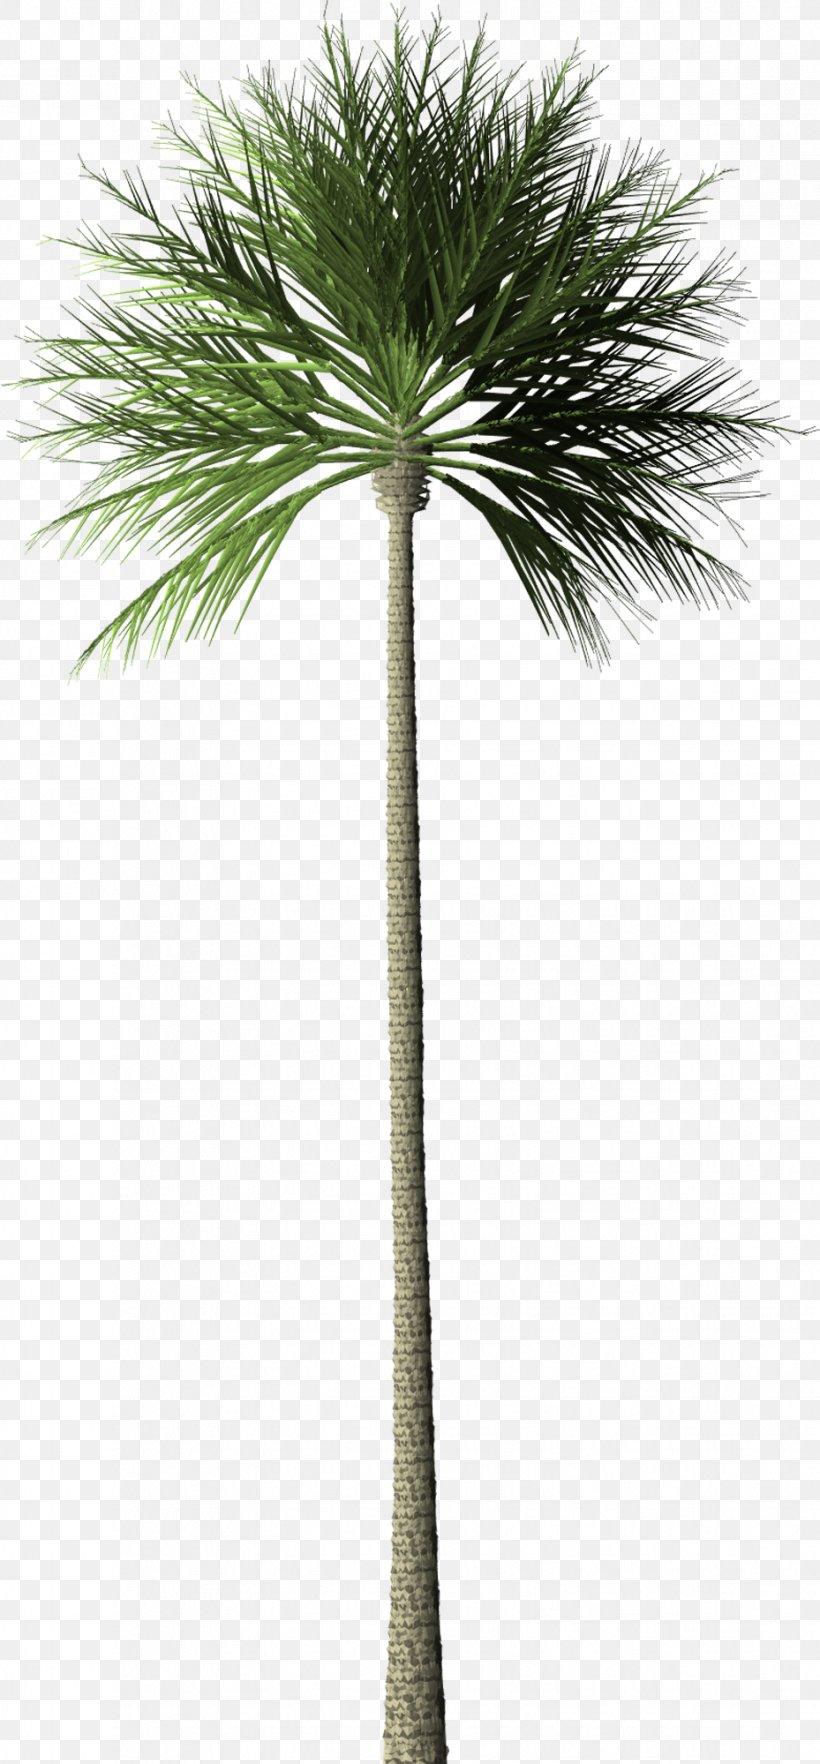 Arecaceae Tree Palm Oil Oil Palms Rainforest, PNG, 929x1999px, Arecaceae, Arecales, Asian Palmyra Palm, Borassus Flabellifer, Date Palm Download Free